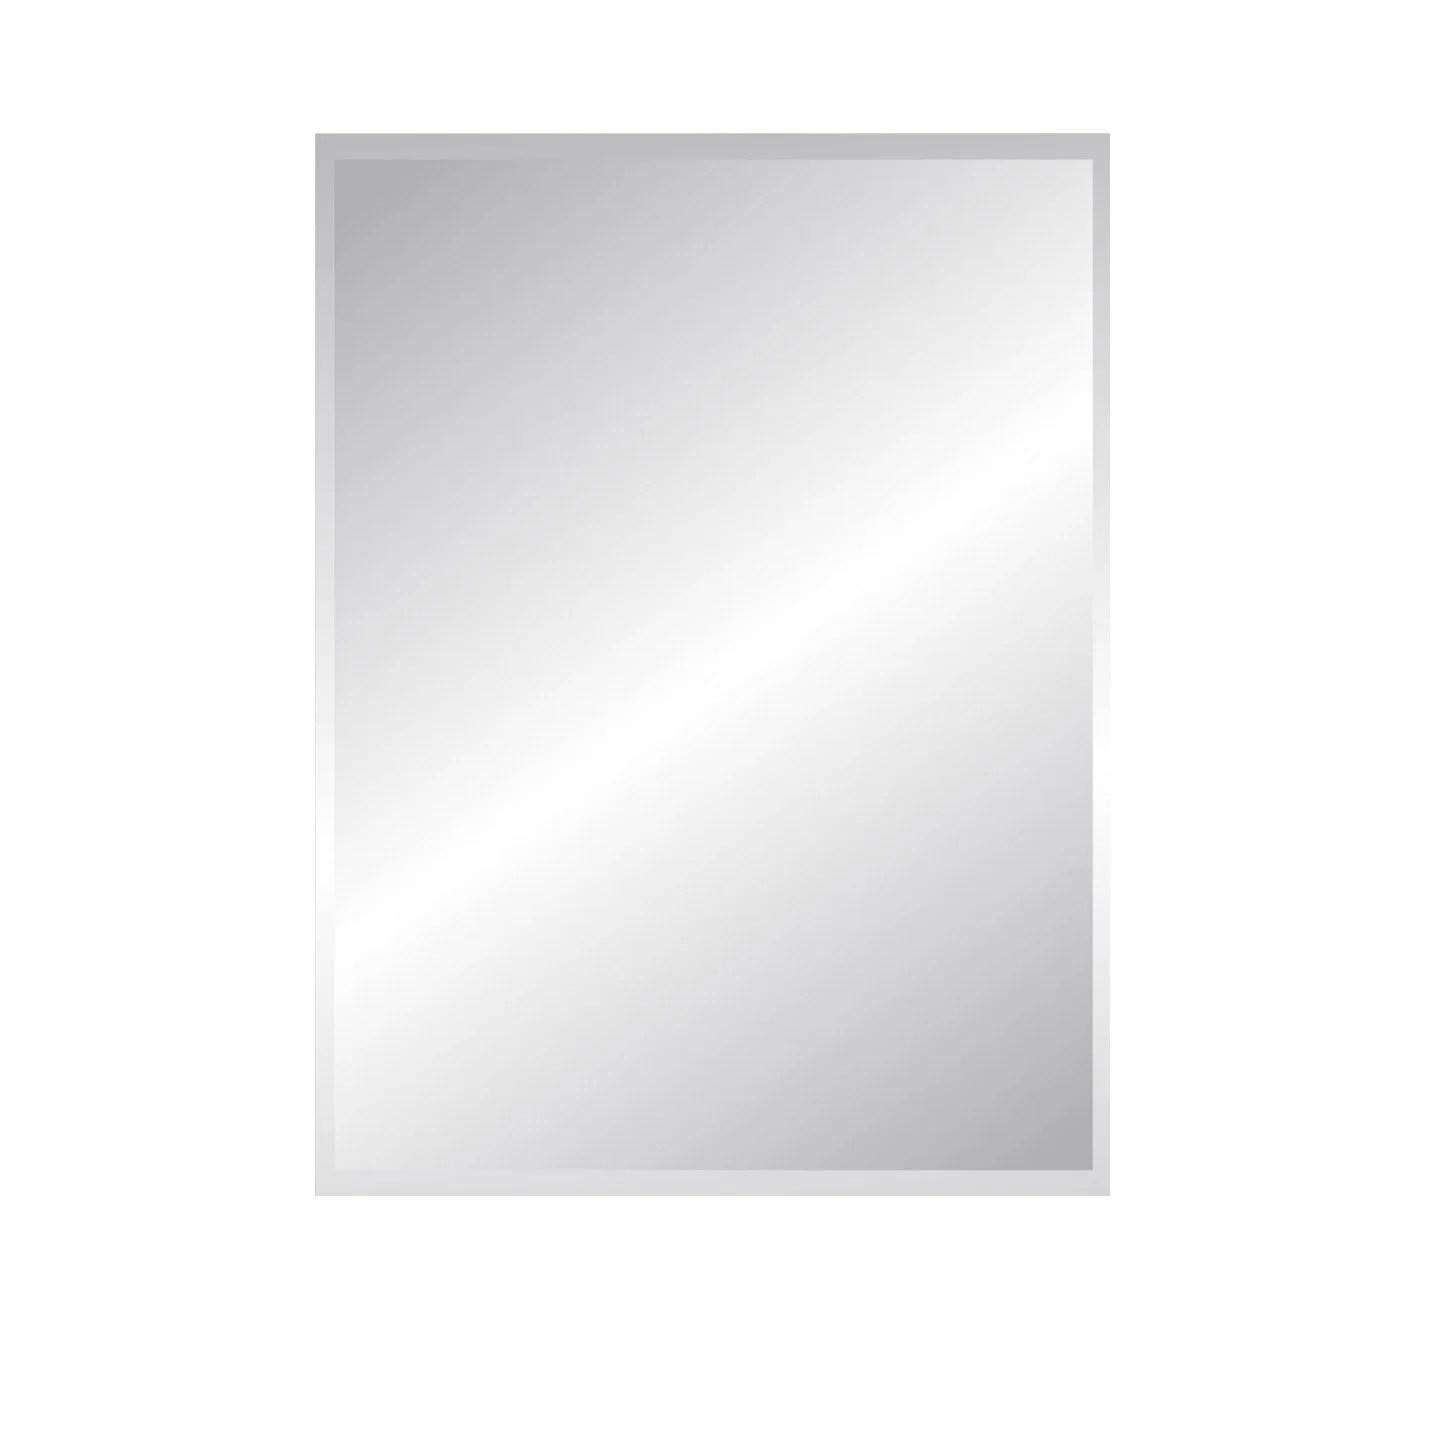 Miroir Salle De Bain 100 X 60 Bright Shadow Online